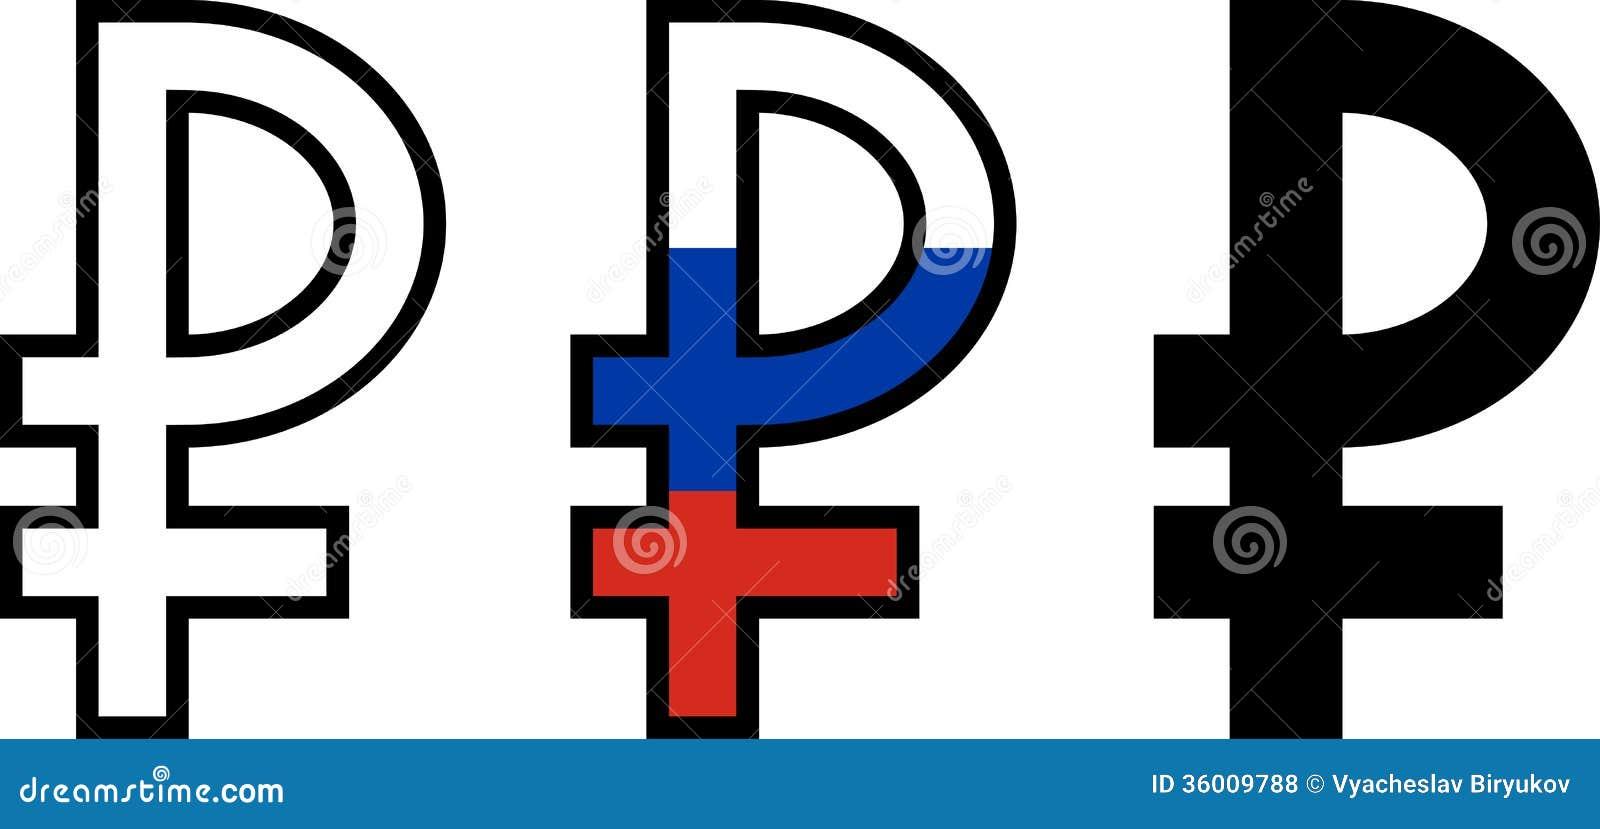 Russian Ruble Symbols Stock Vector Illustration Of Flag 36009788